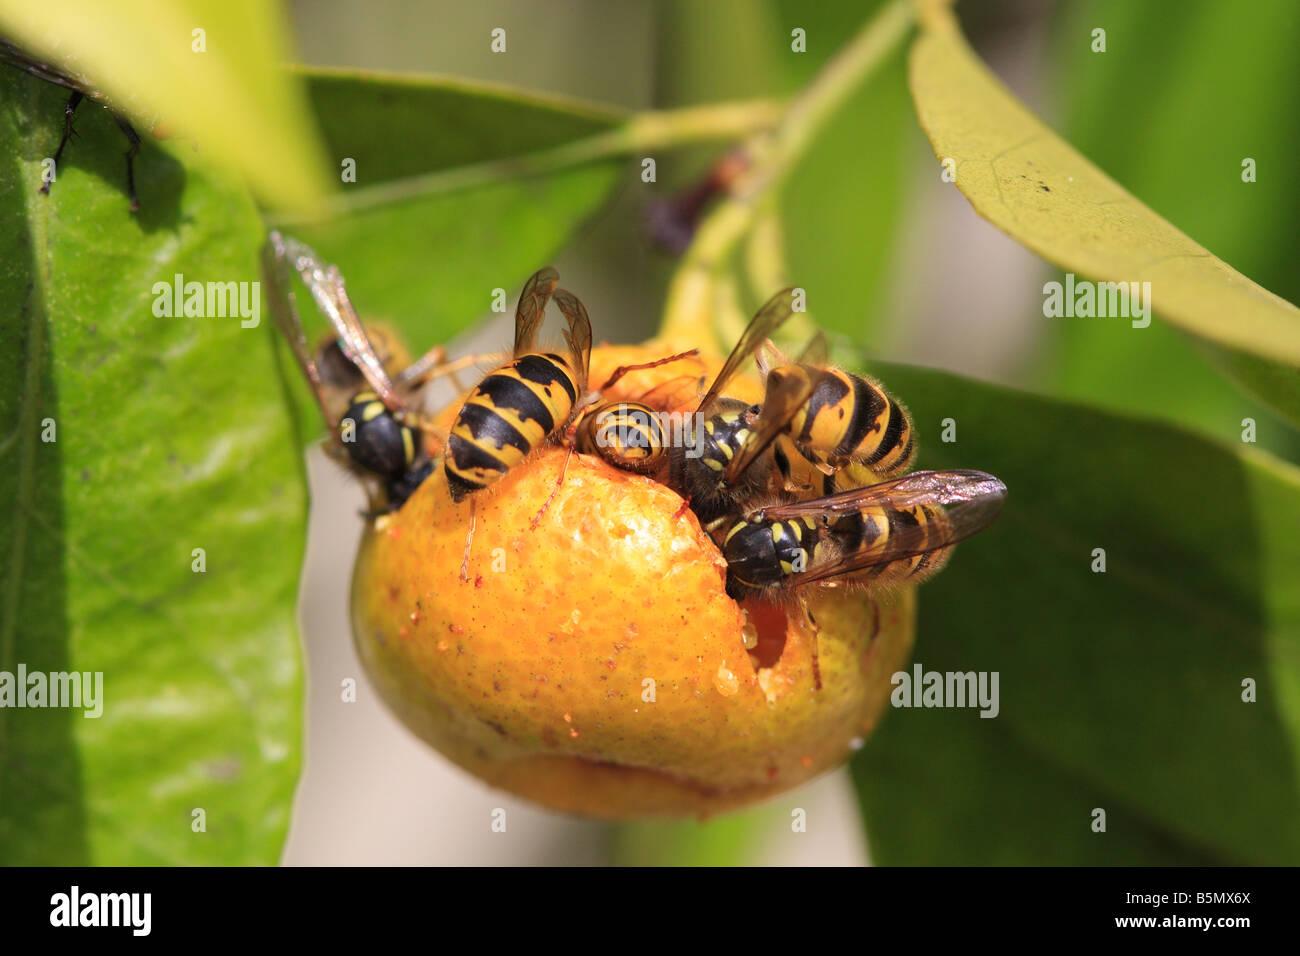 COMMON WASP Paravespula vulgaris EATING CITRUS LEMON FLORENTINA - Stock Image